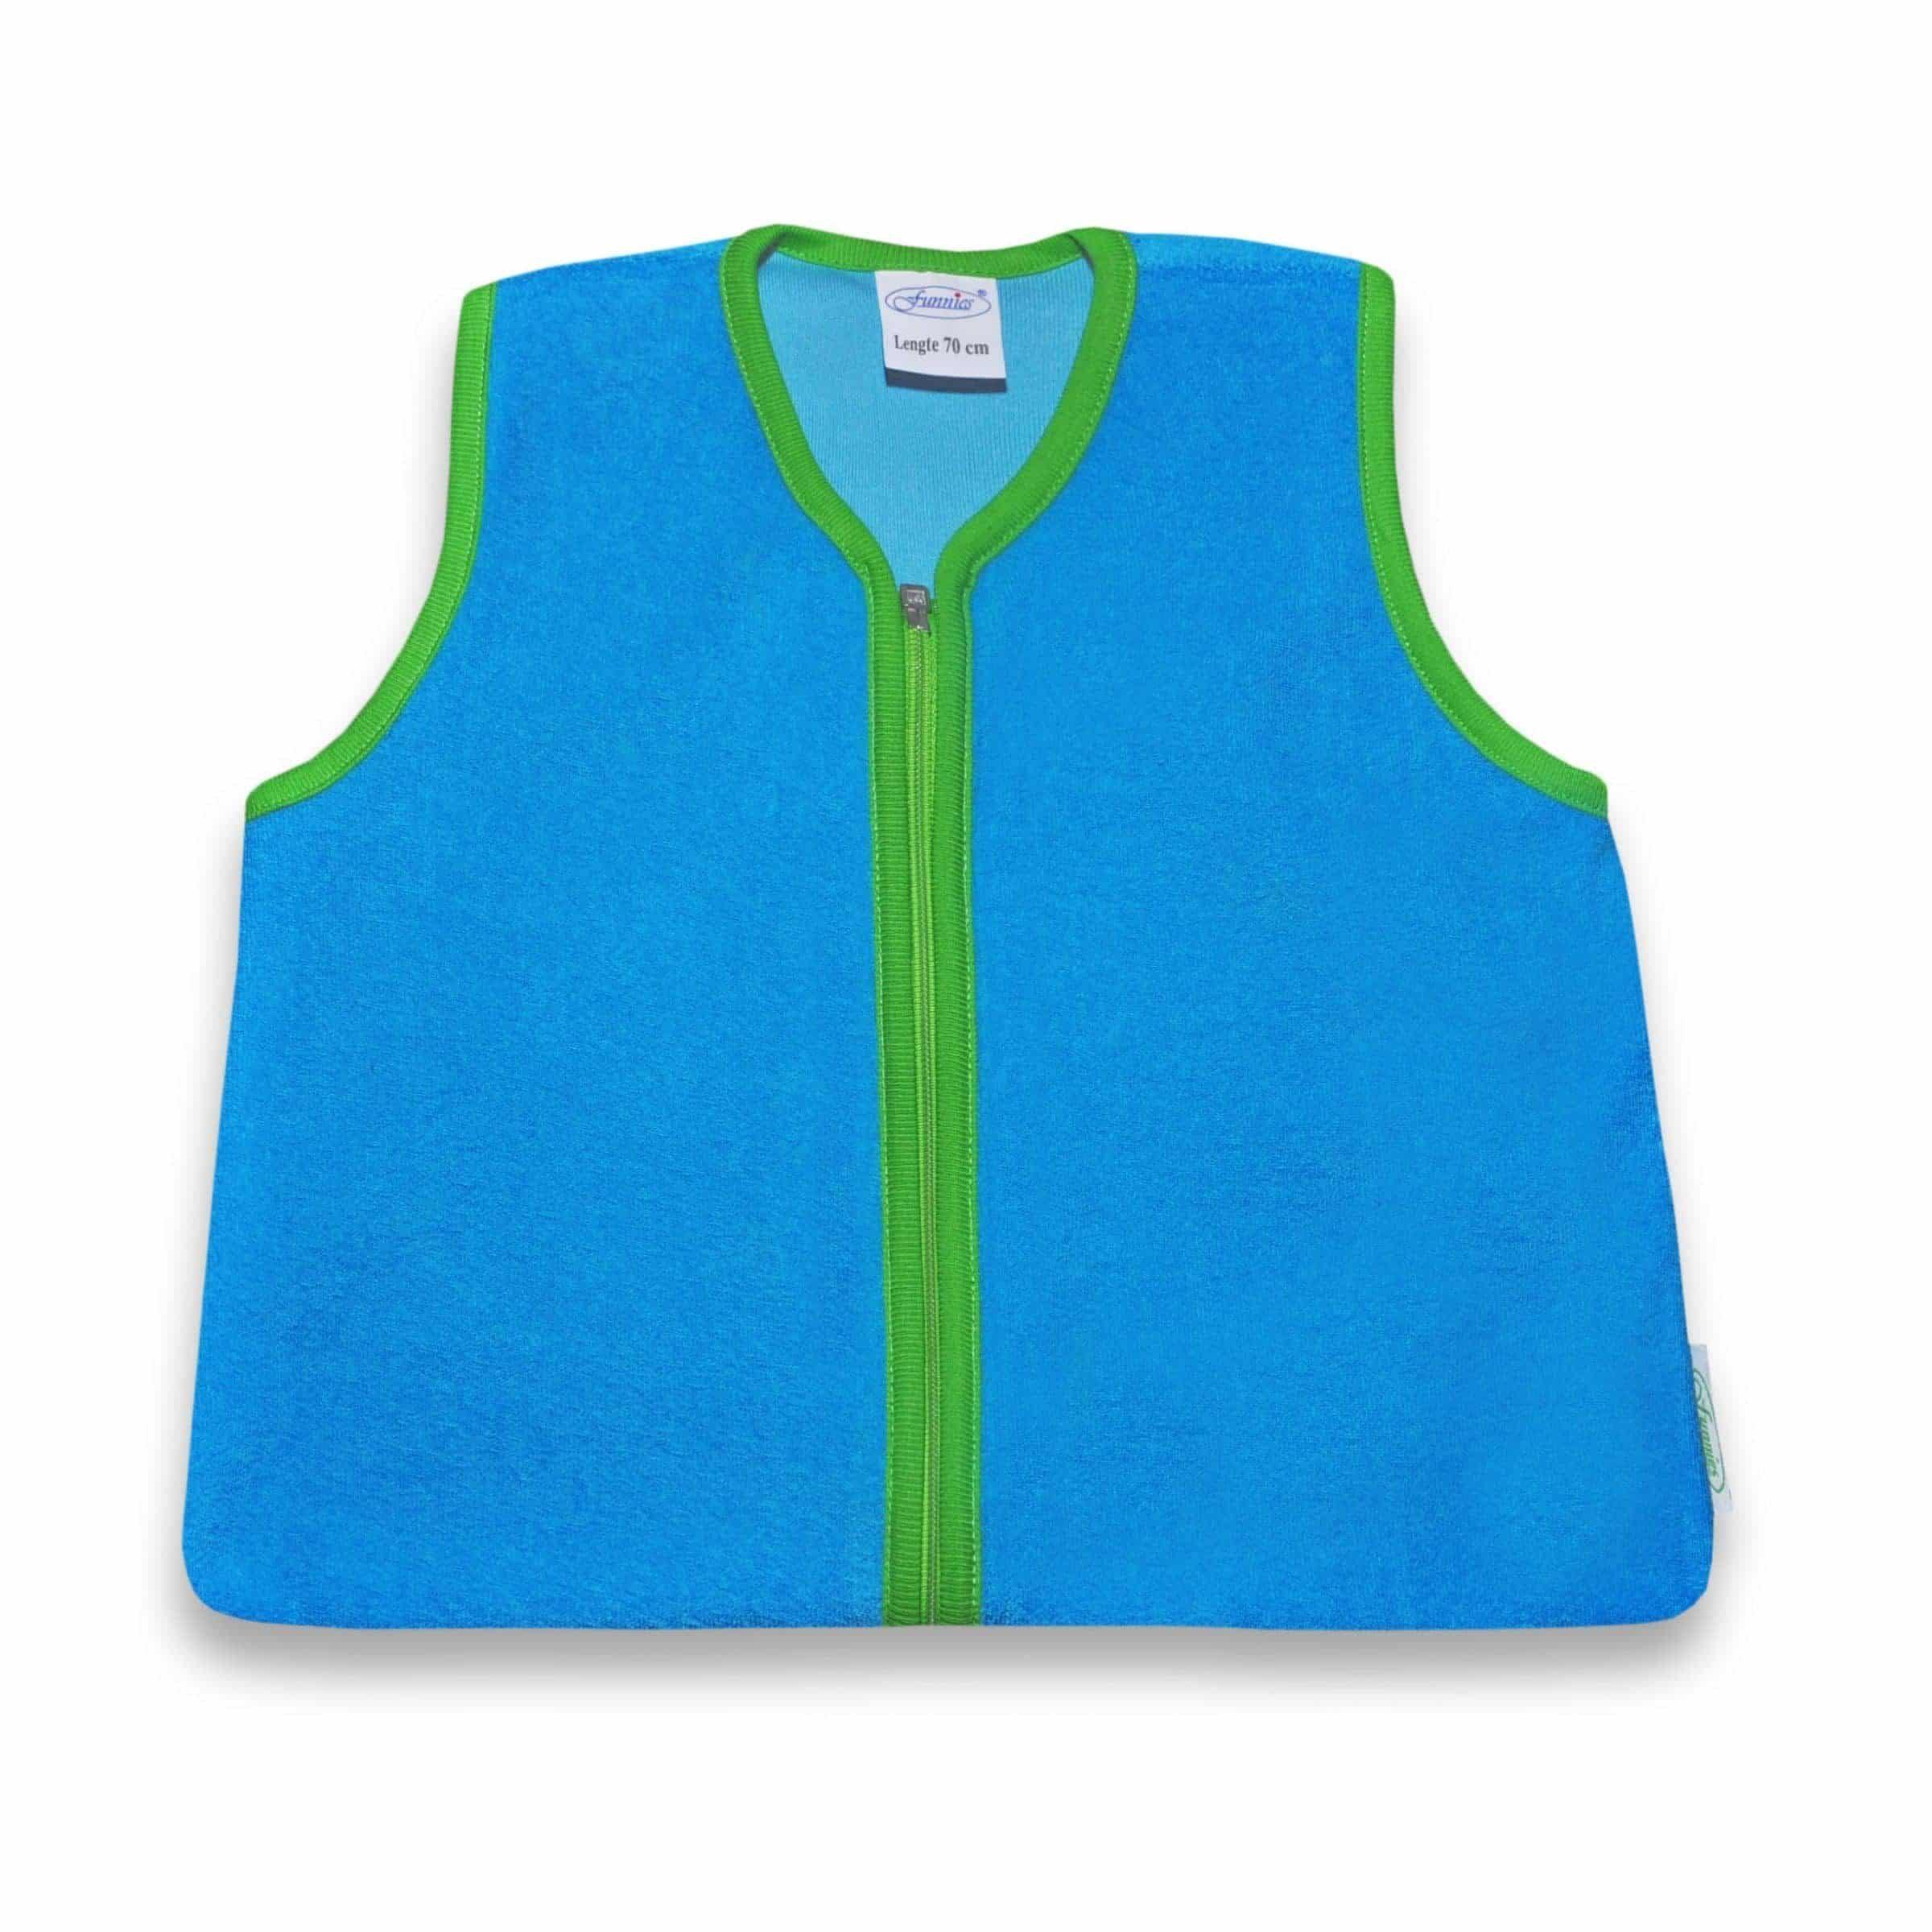 Slaapzak turquoise/groen, 70cm